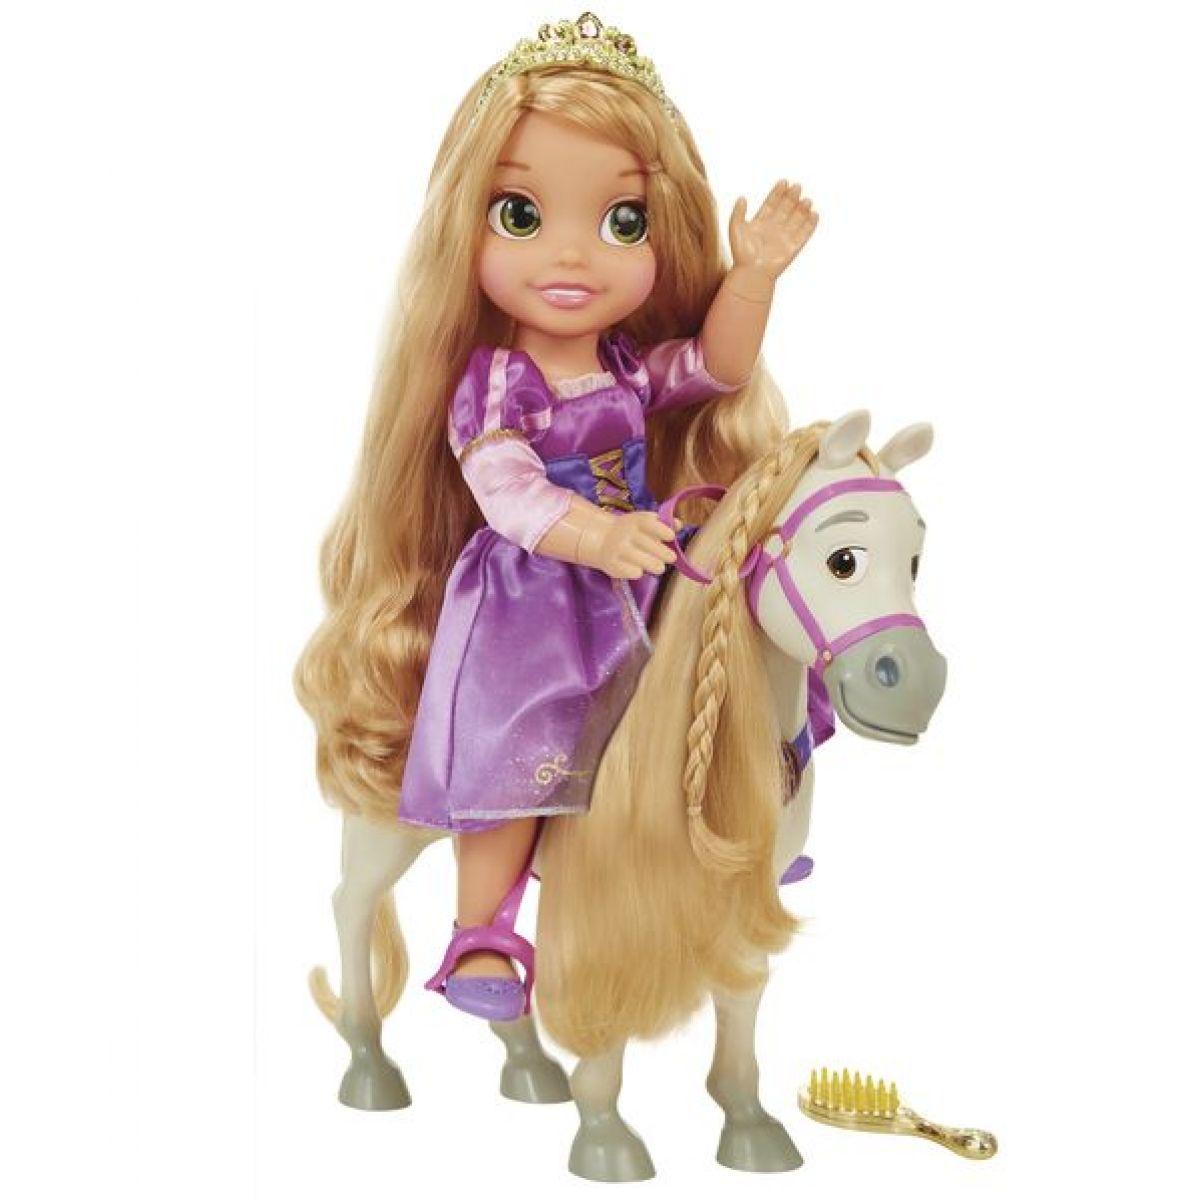 ADC Blackfire Disney Princess Princezna Locika a Maximus